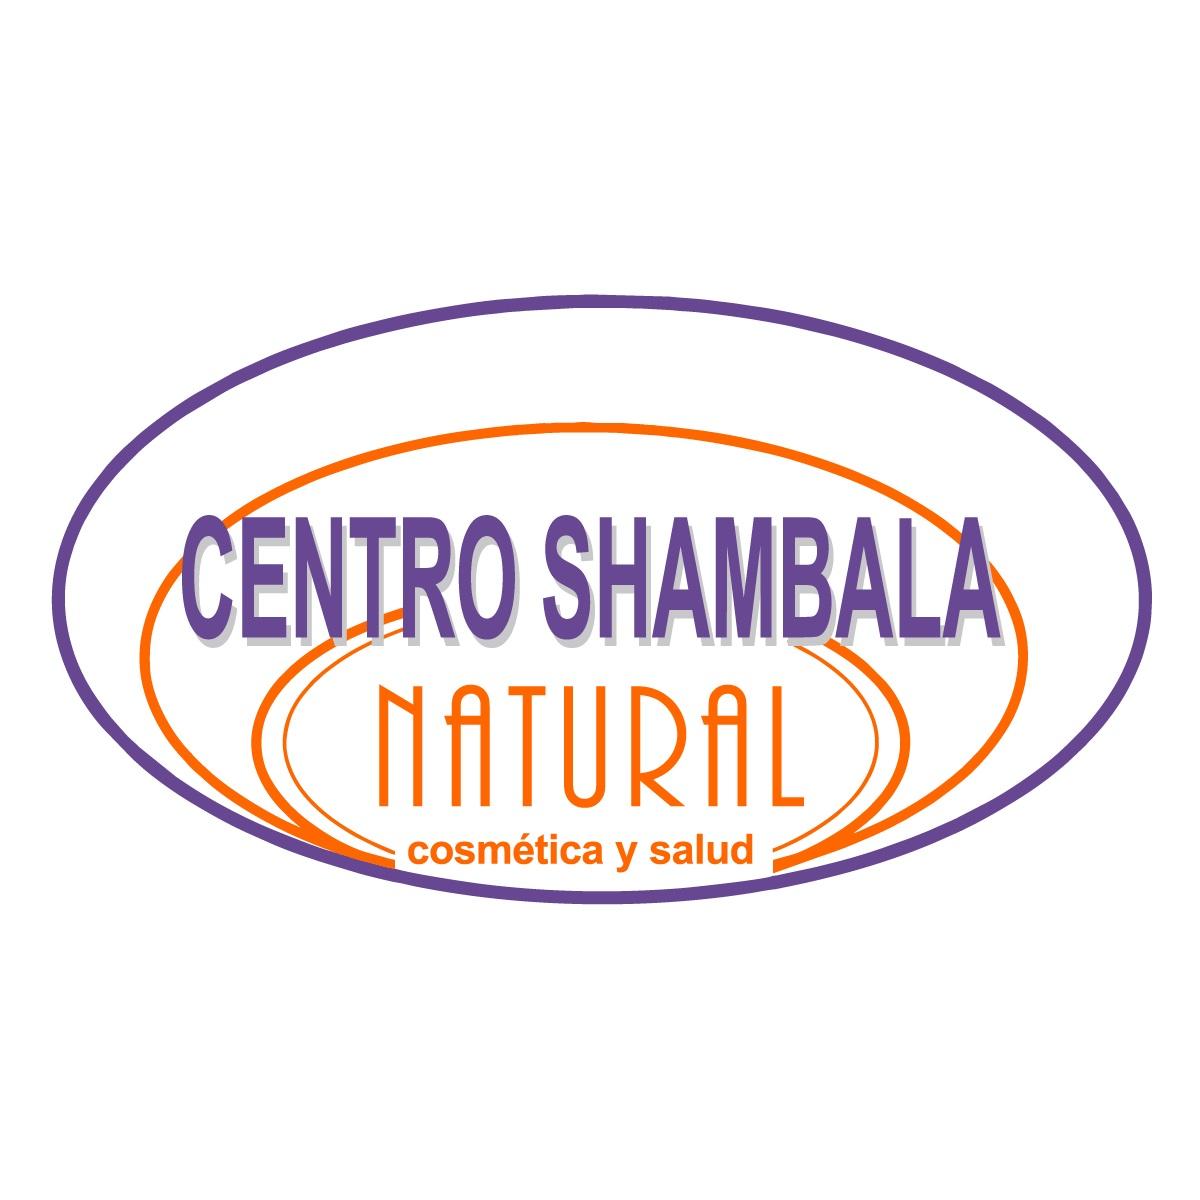 Centro Shambala Natural